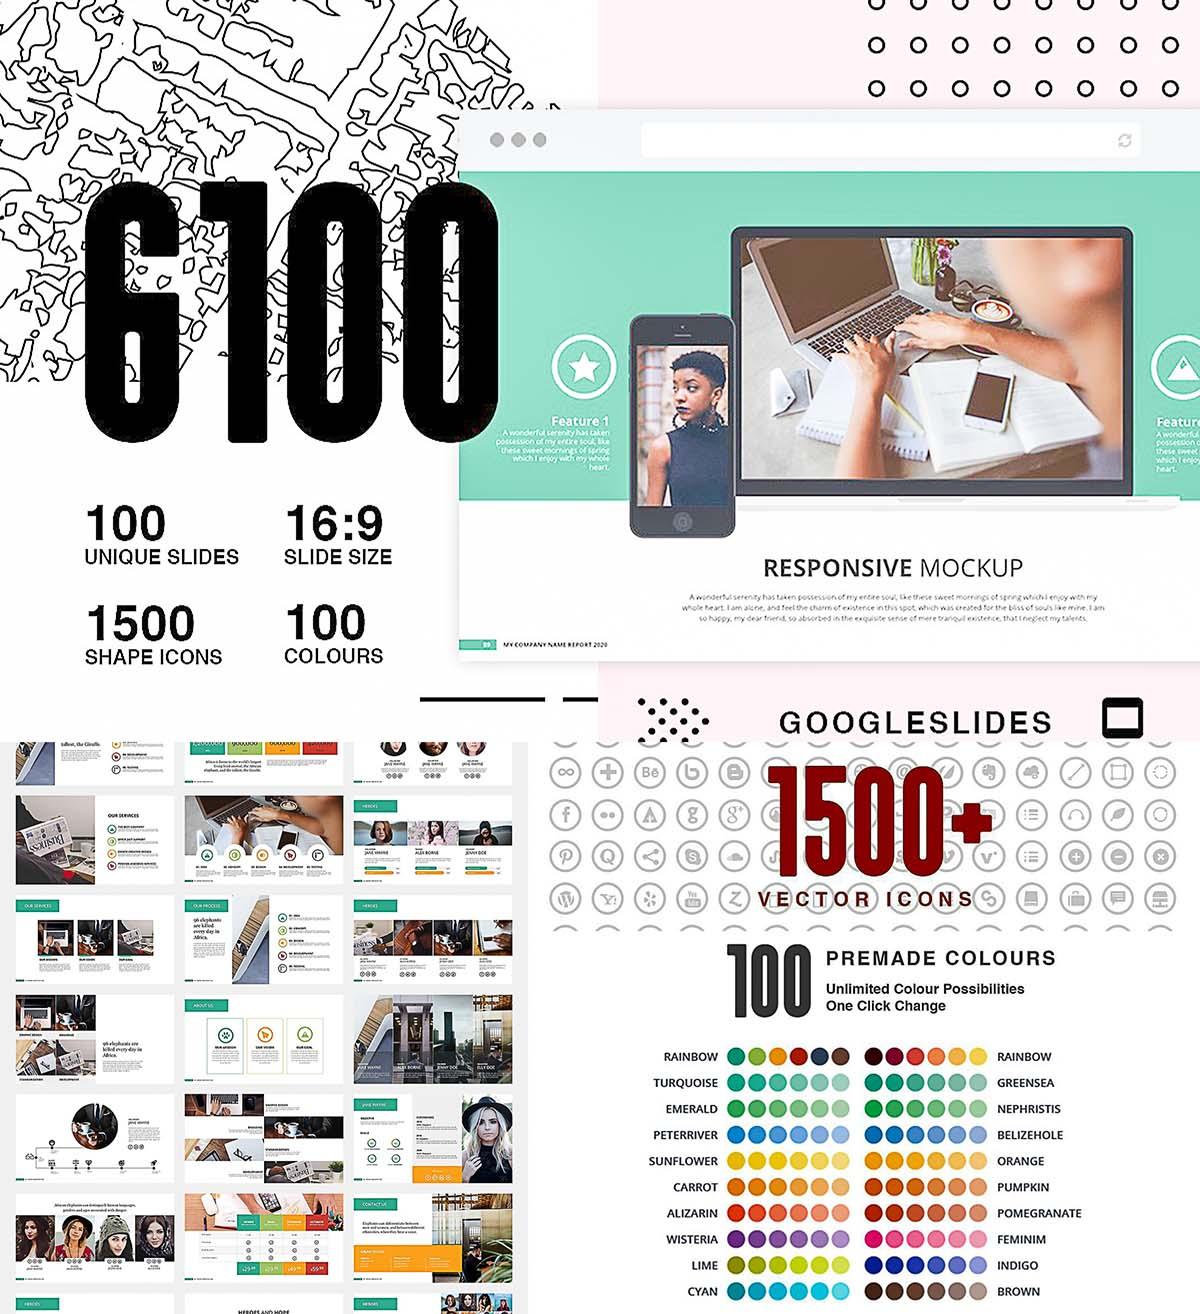 Google g100 slides presentation